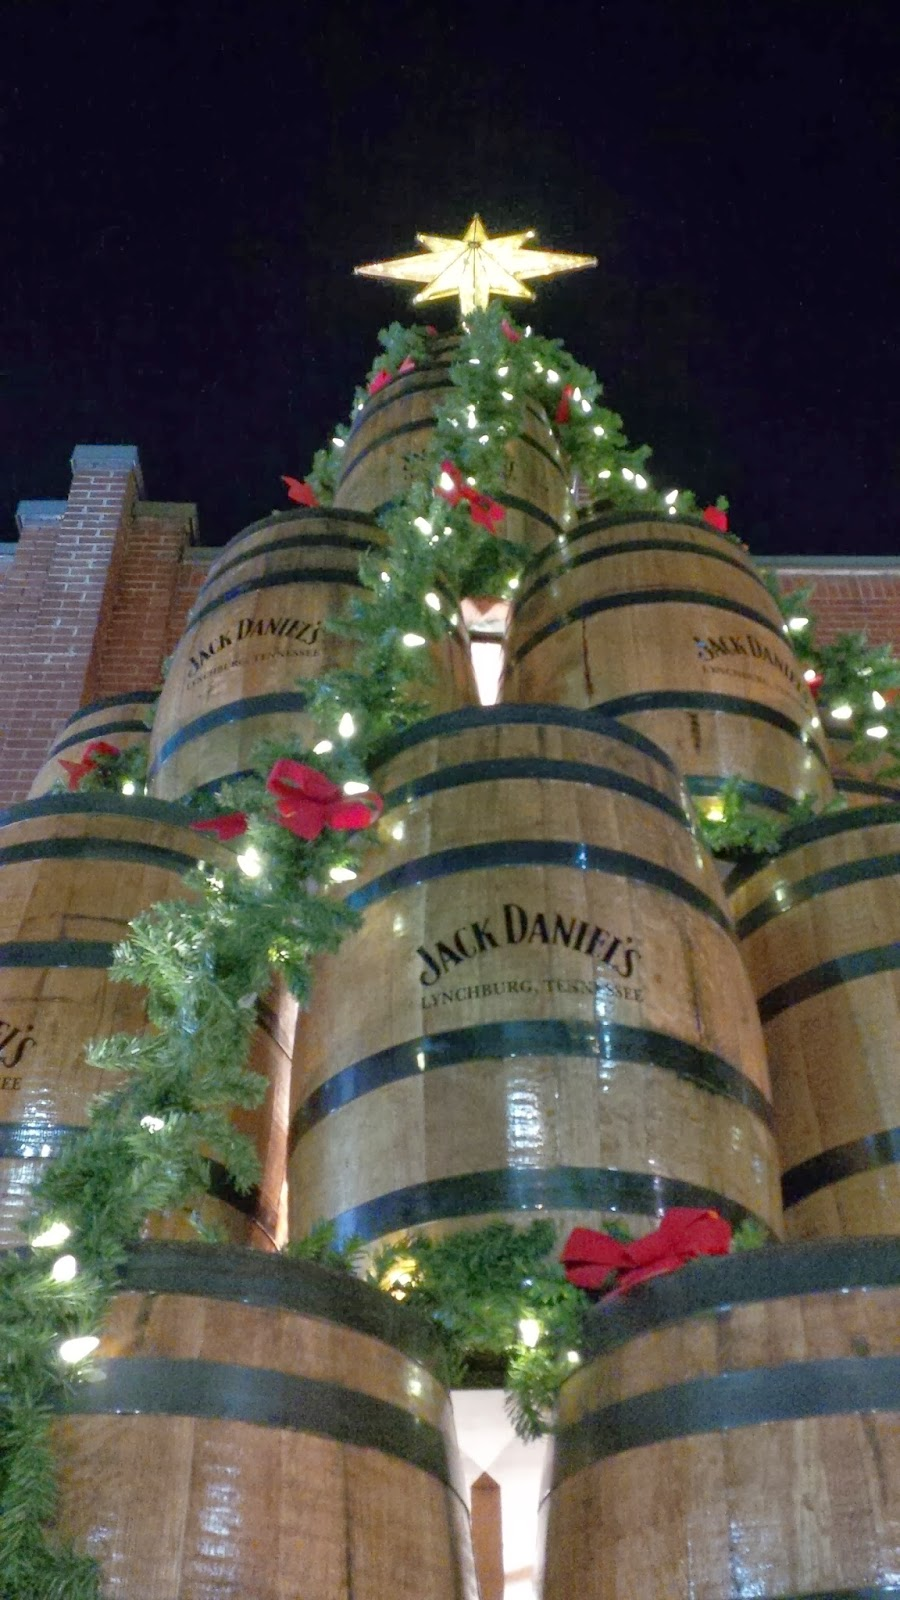 Jack daniel s barrel tree lighting ceremony real man travels